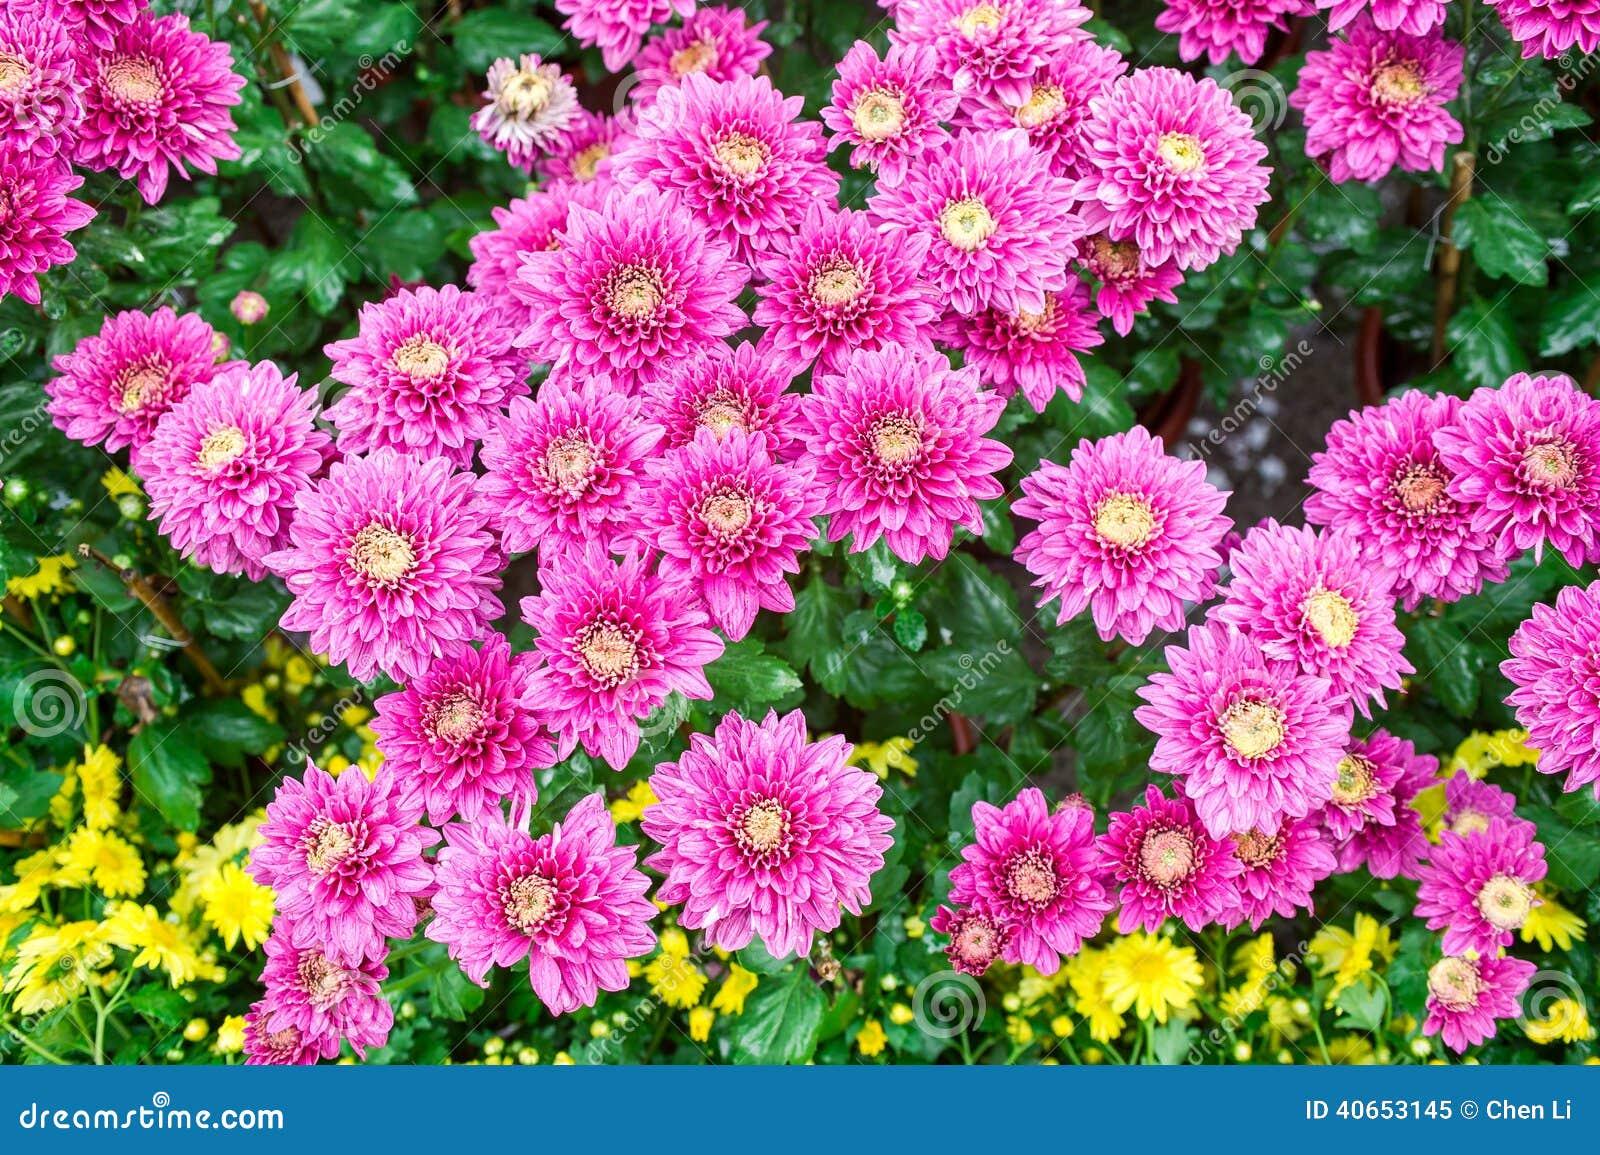 Chrysanthemum Stock Photo Image 40653145